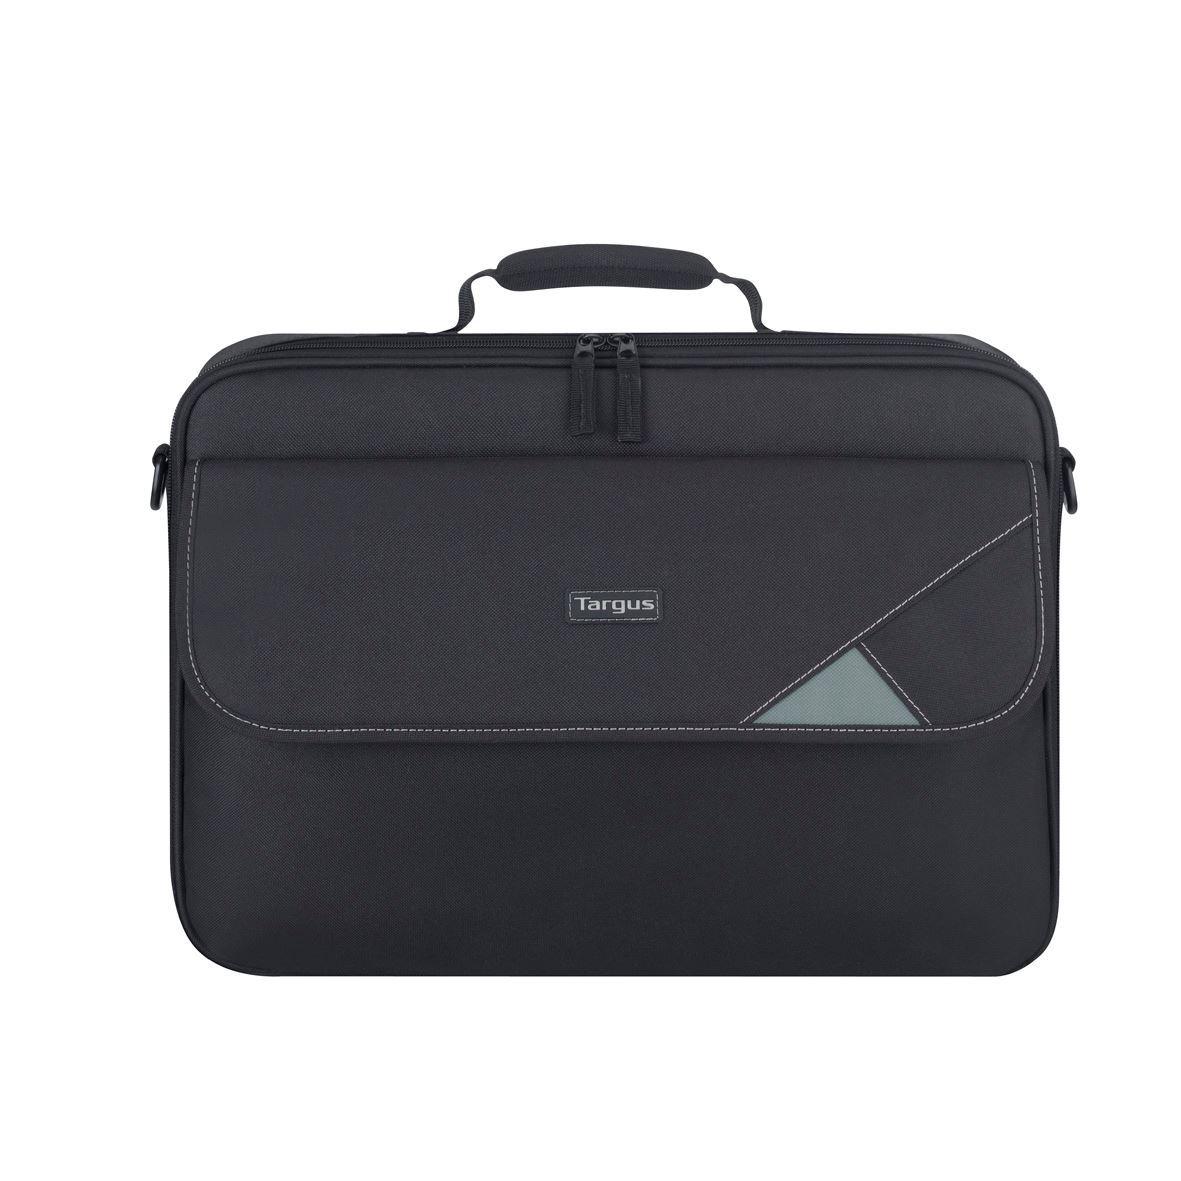 intellect clamshell sacoche pour ordinateur portable 17 3. Black Bedroom Furniture Sets. Home Design Ideas